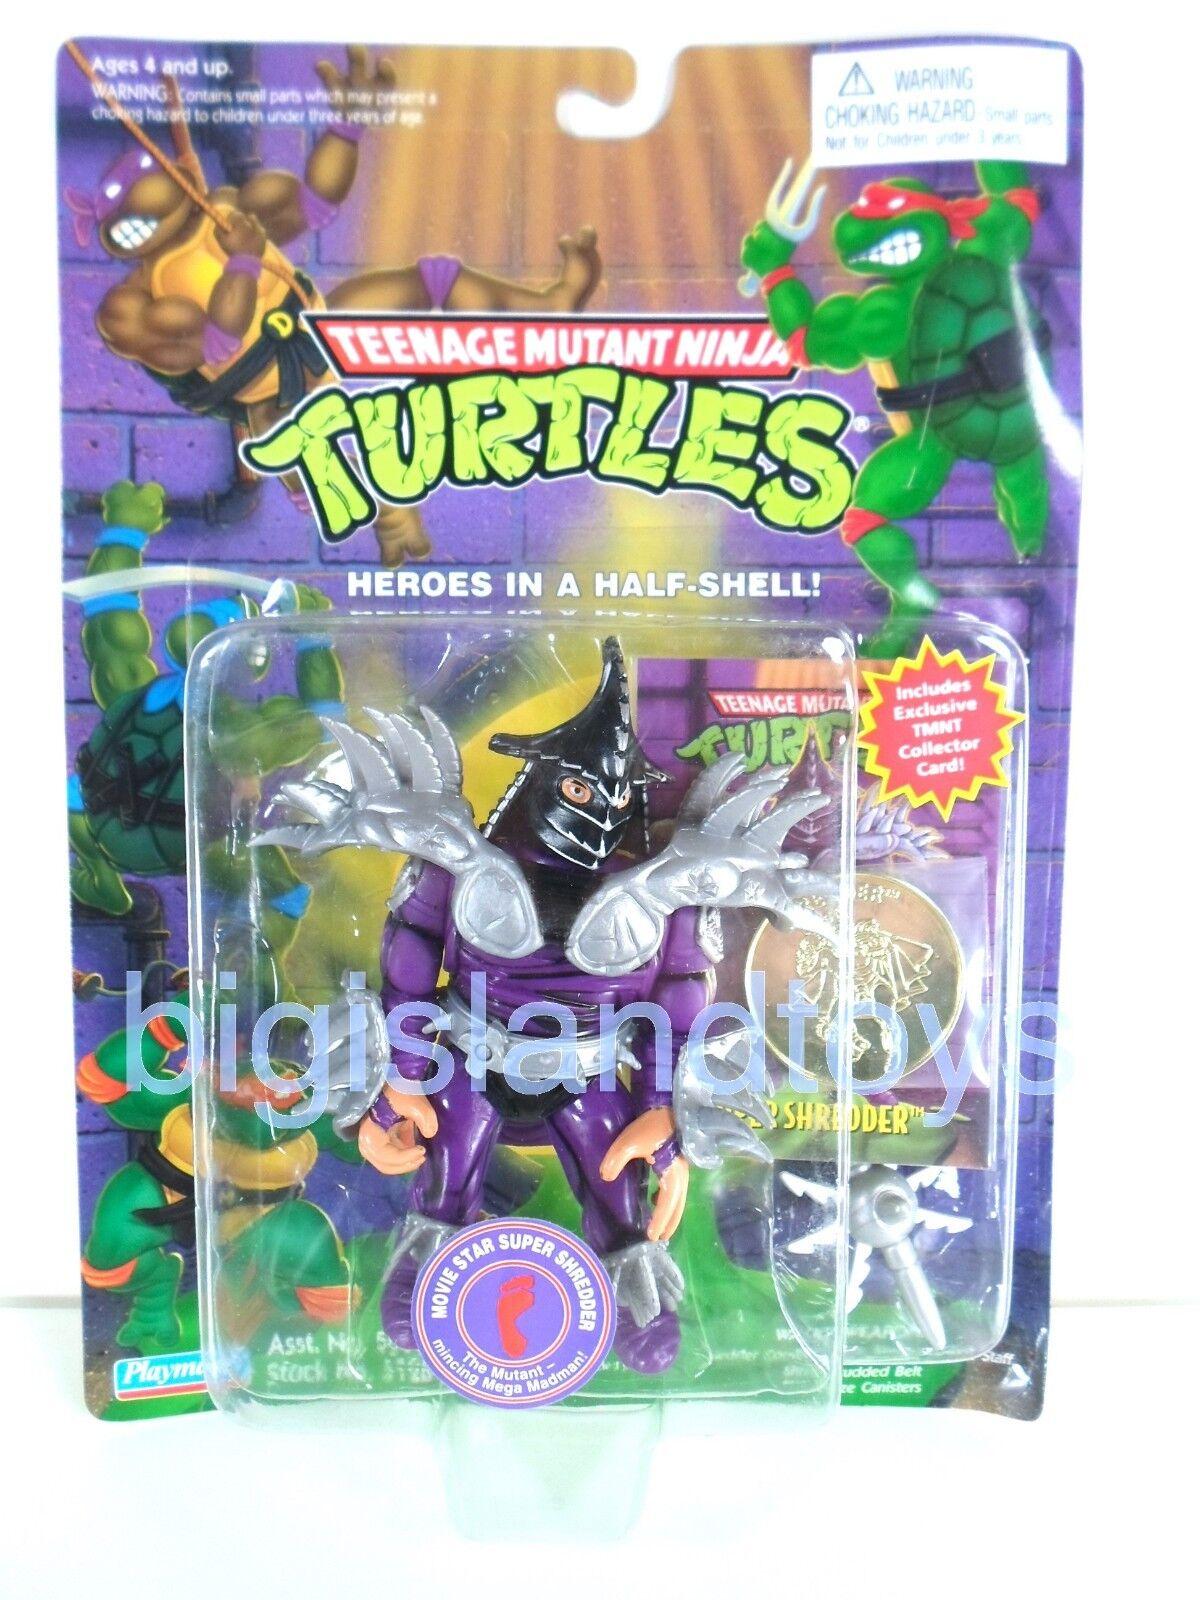 Teenage Mutant Ninja Turtles Playmates estrella de cine Super Shrossoder Con Moneda Y Tarjeta